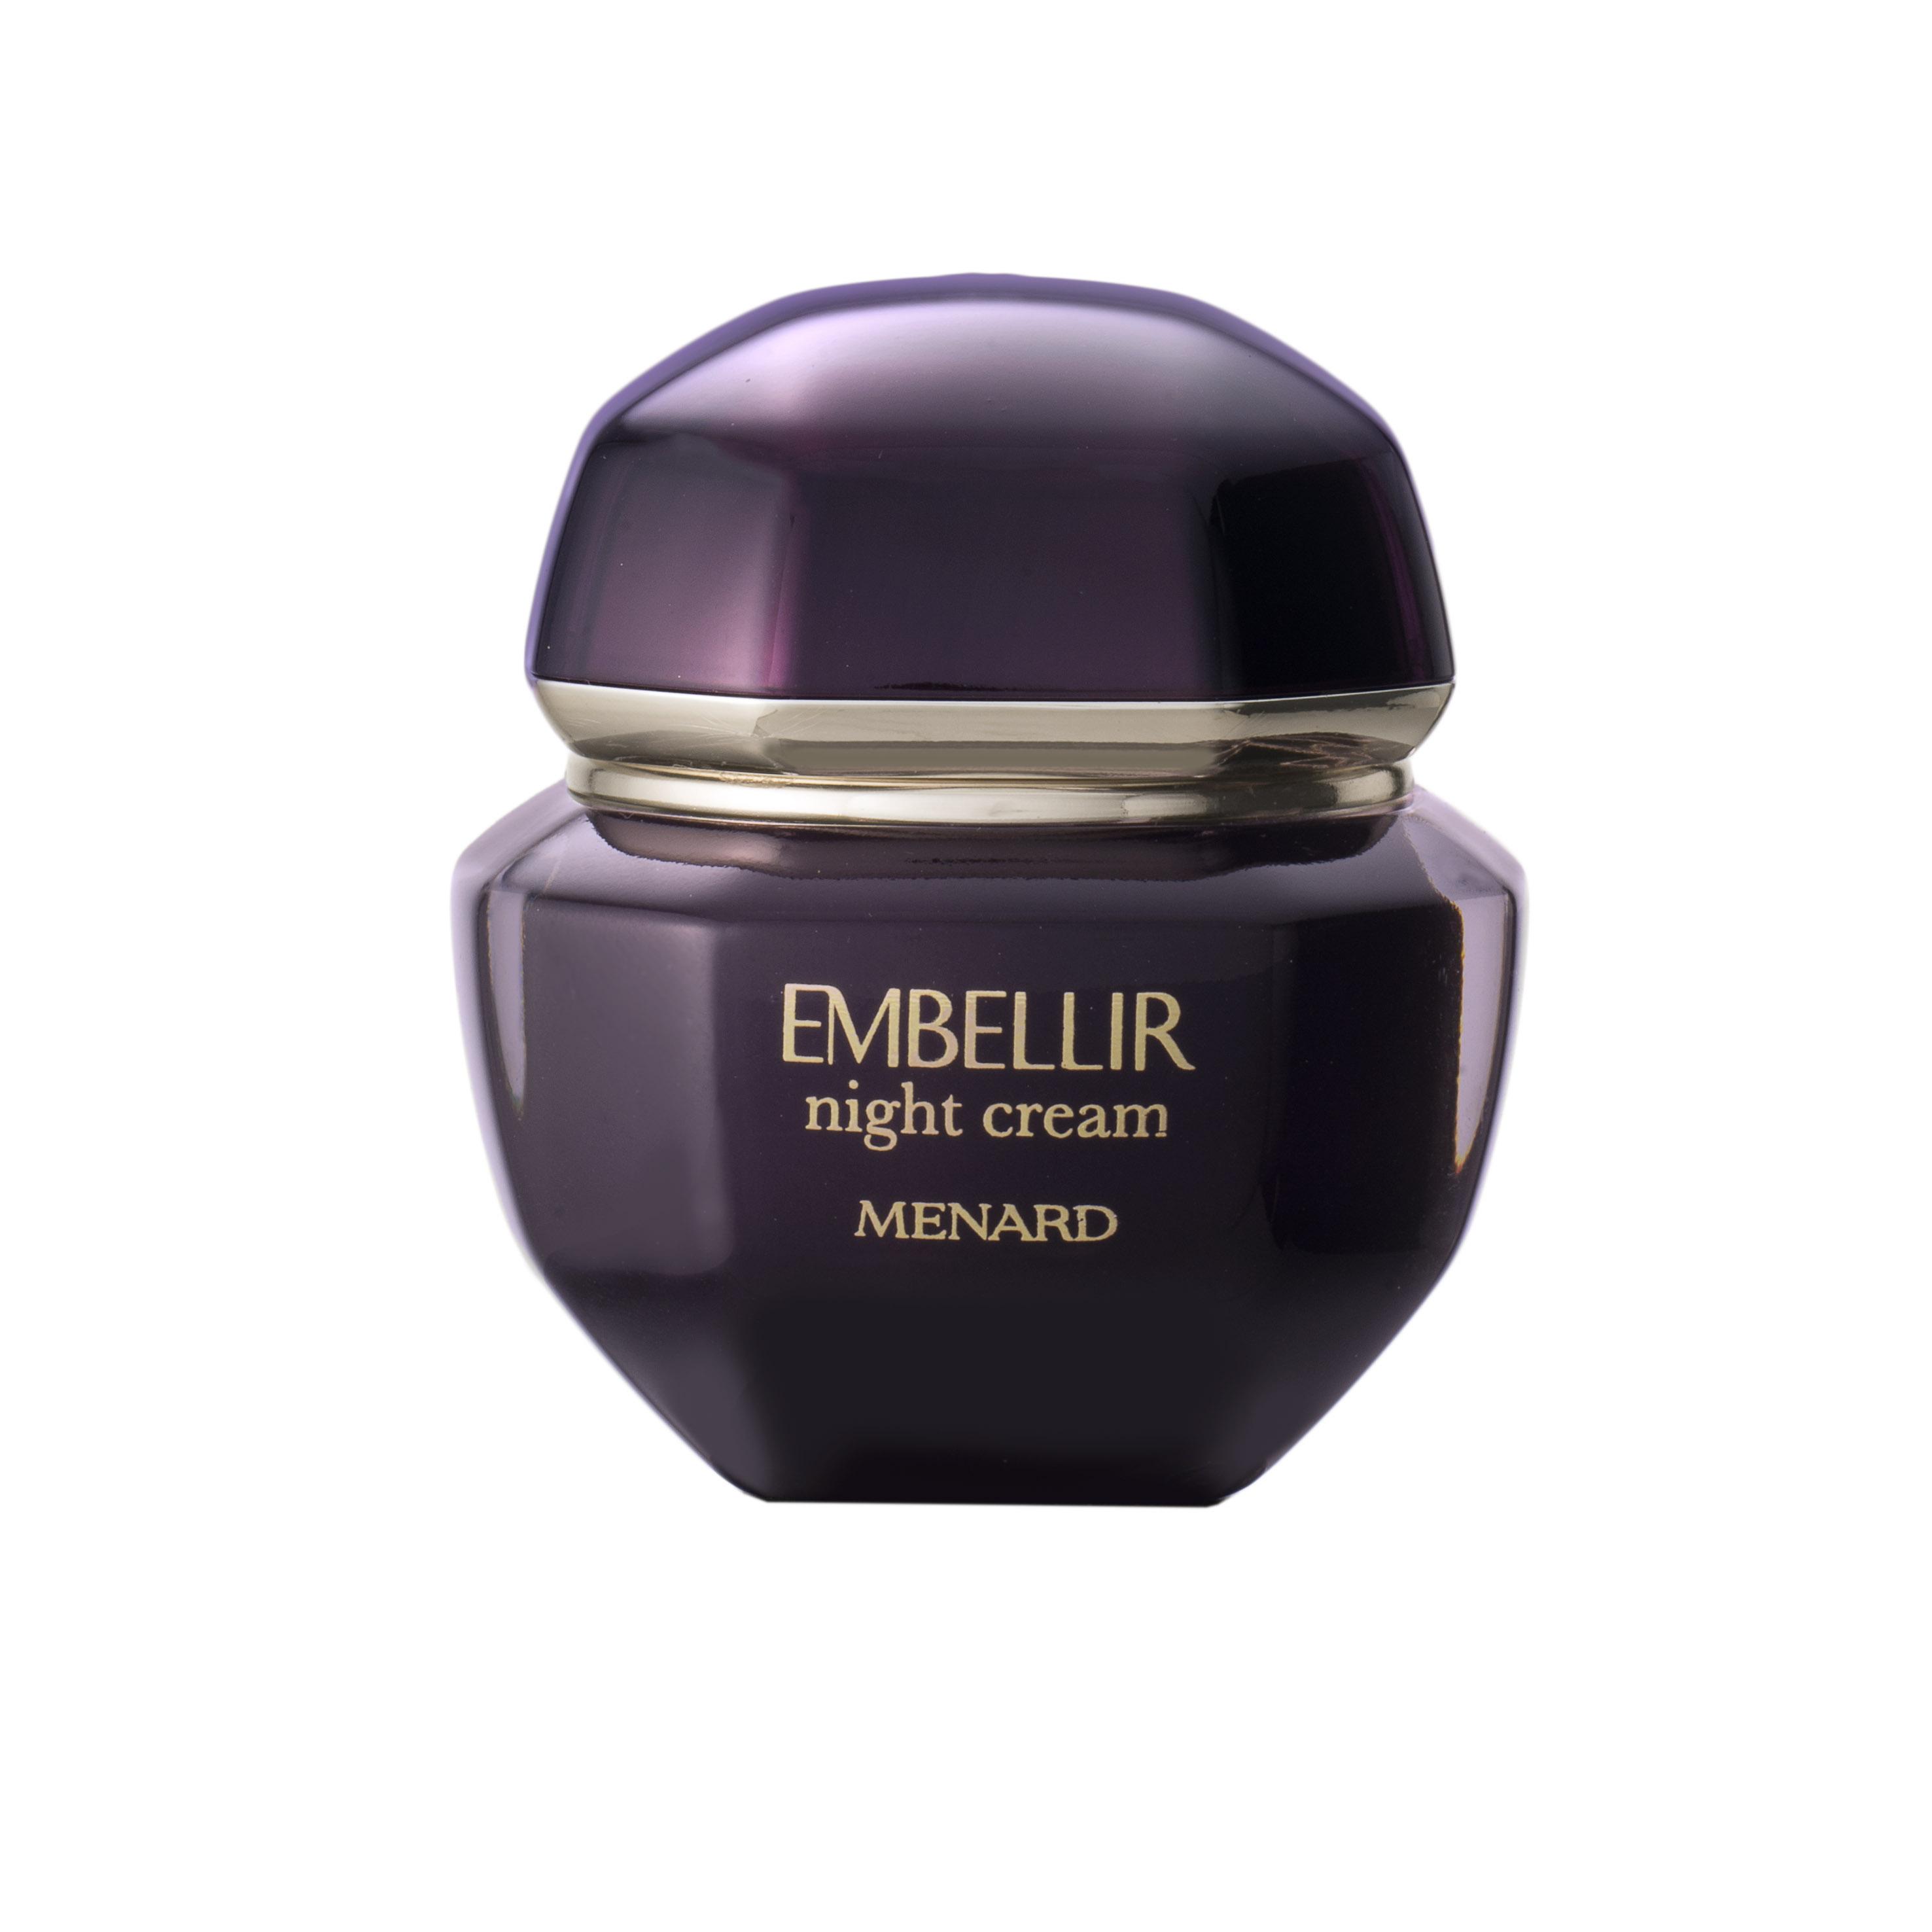 Menard Embellir Night Cream